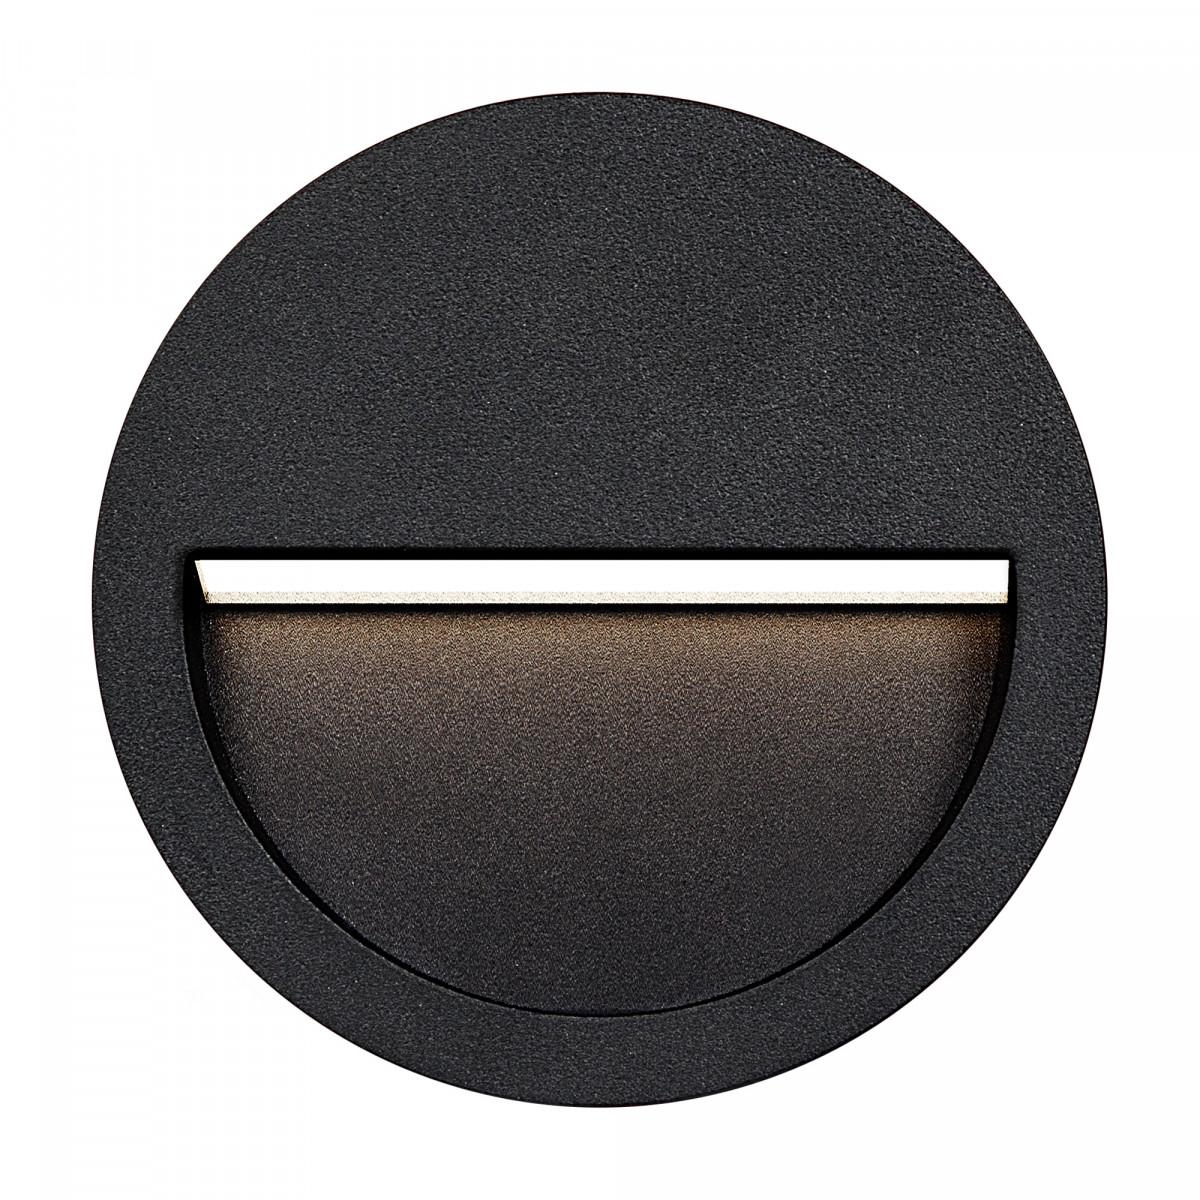 Wandspot LED Section 2 downlighter